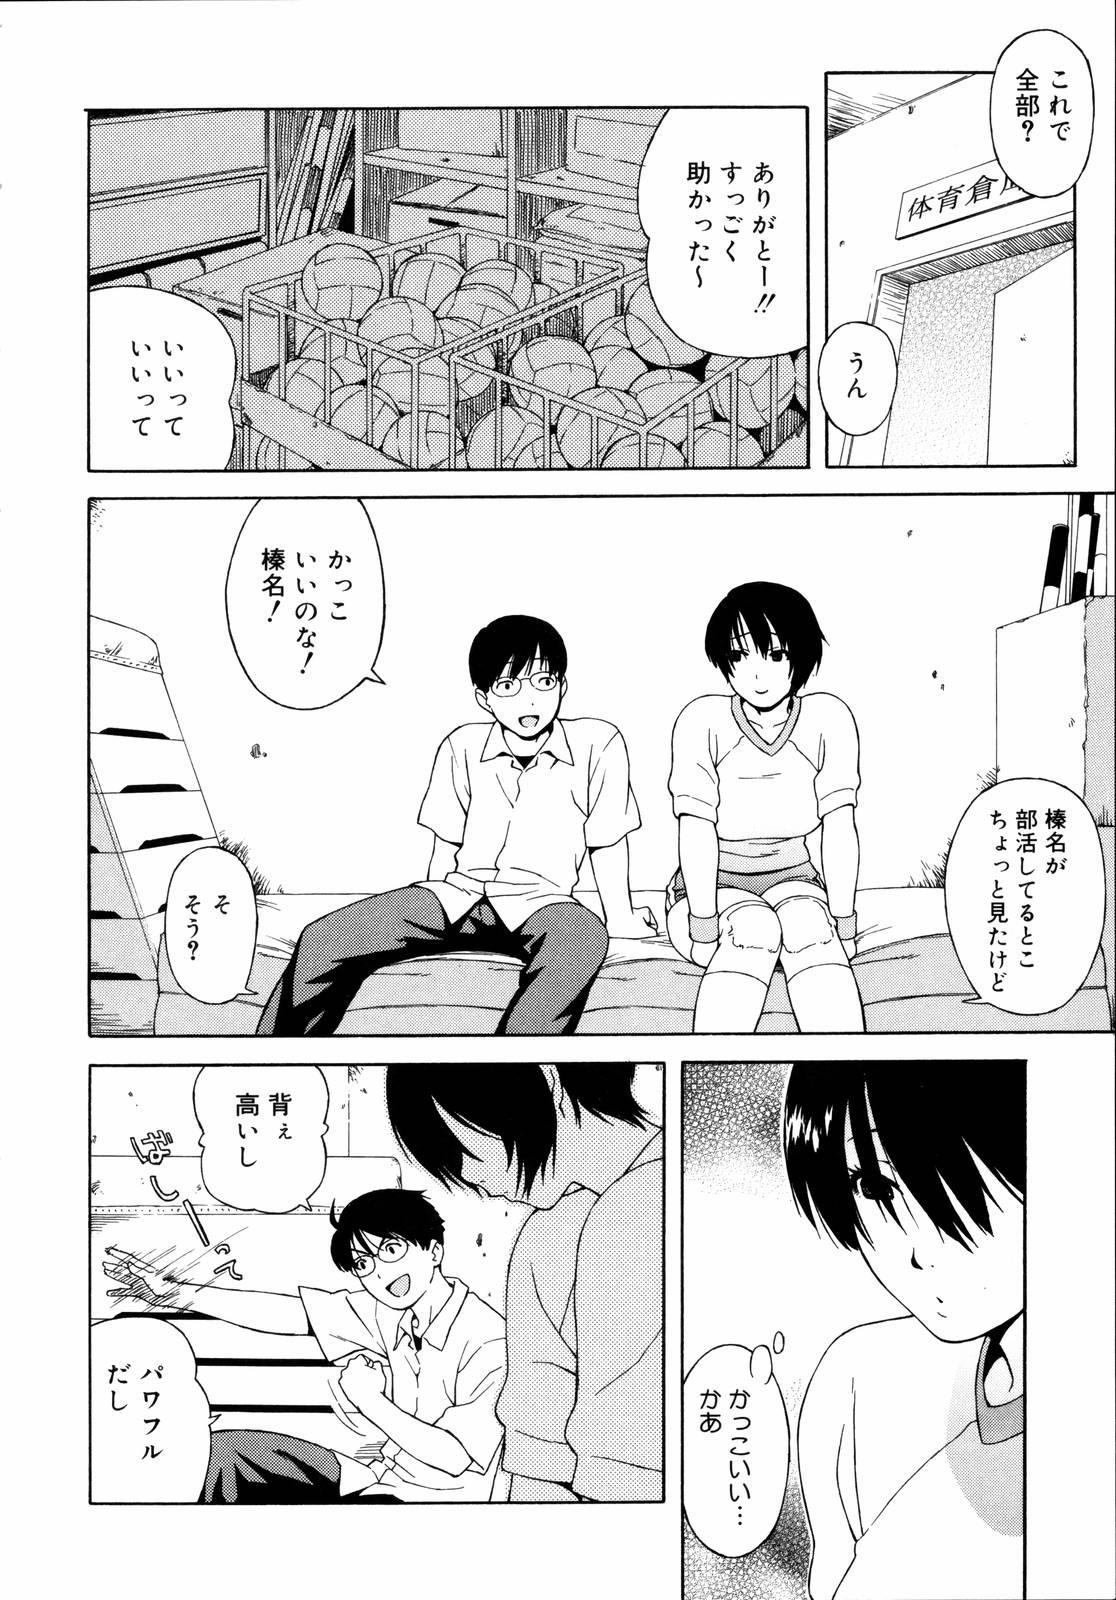 Shishunki wa Hatsujouki - Adolescence is a sexual excitement period. 9